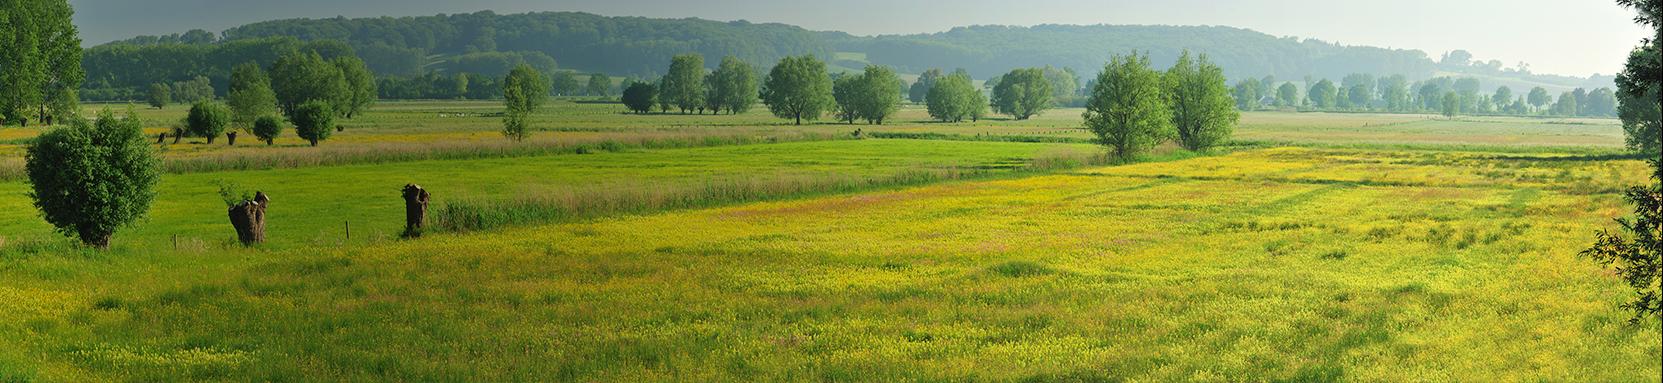 Graslandbeheer